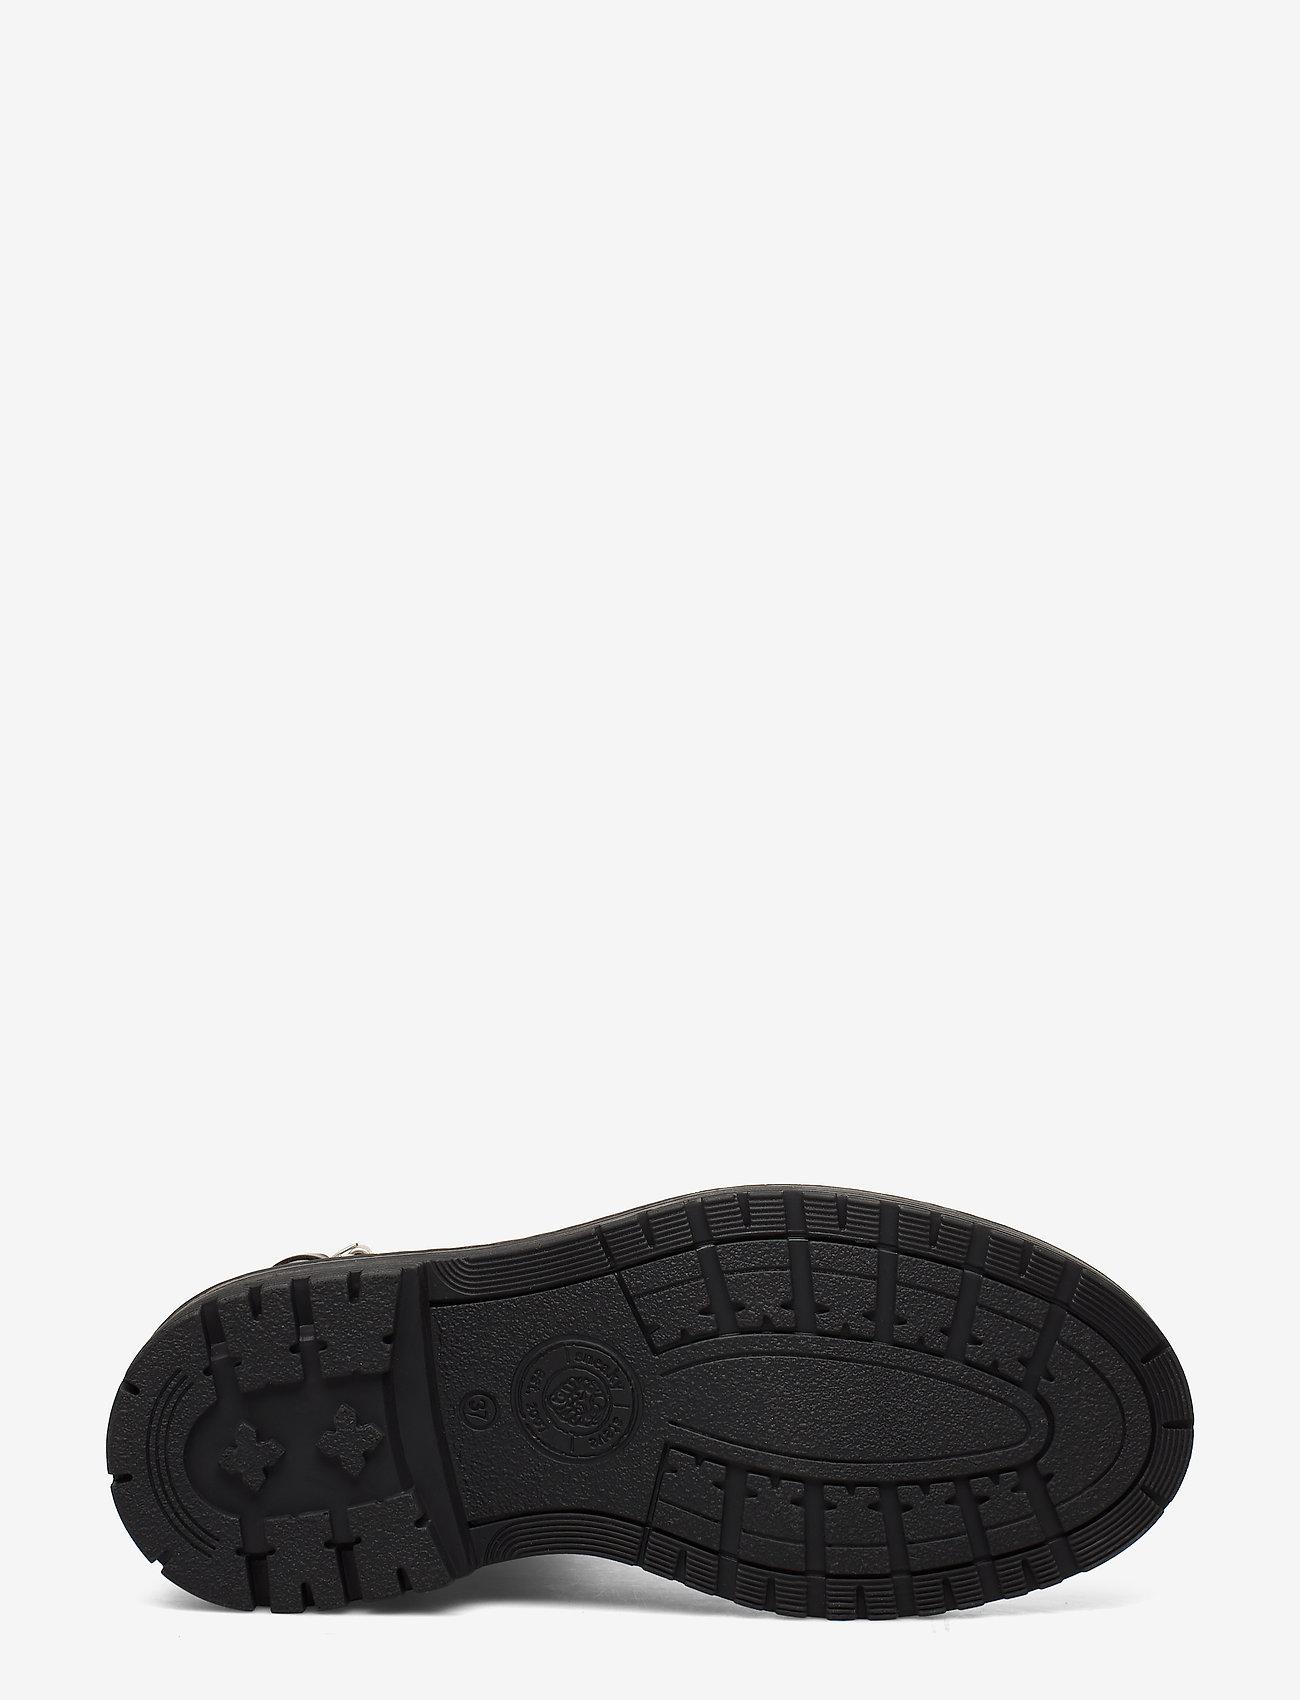 Least W (Black) (120 €) - Sneaky Steve 2CanotO8